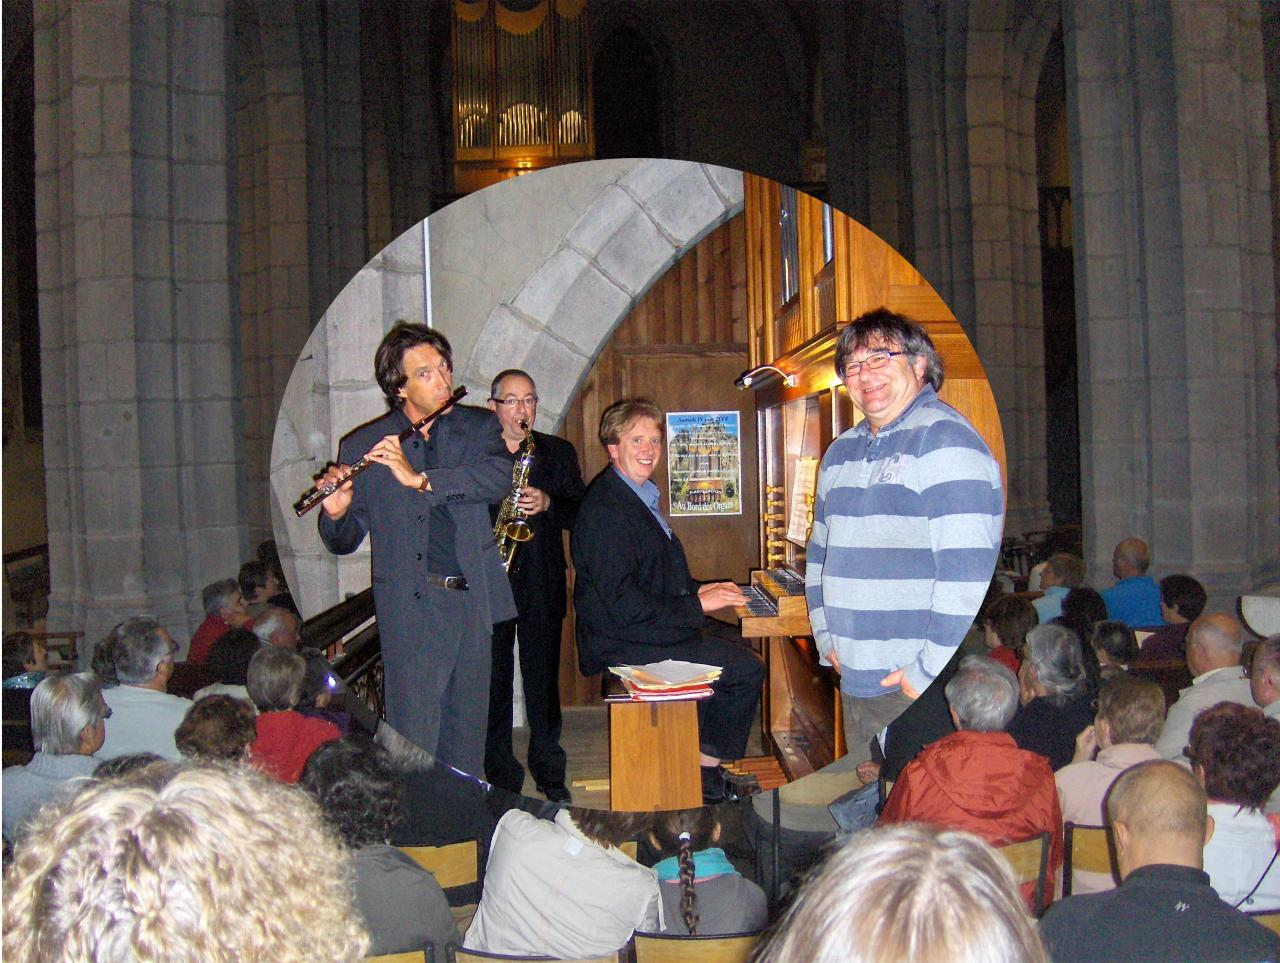 juillet 2012: Flûtes, saxophones et orgue